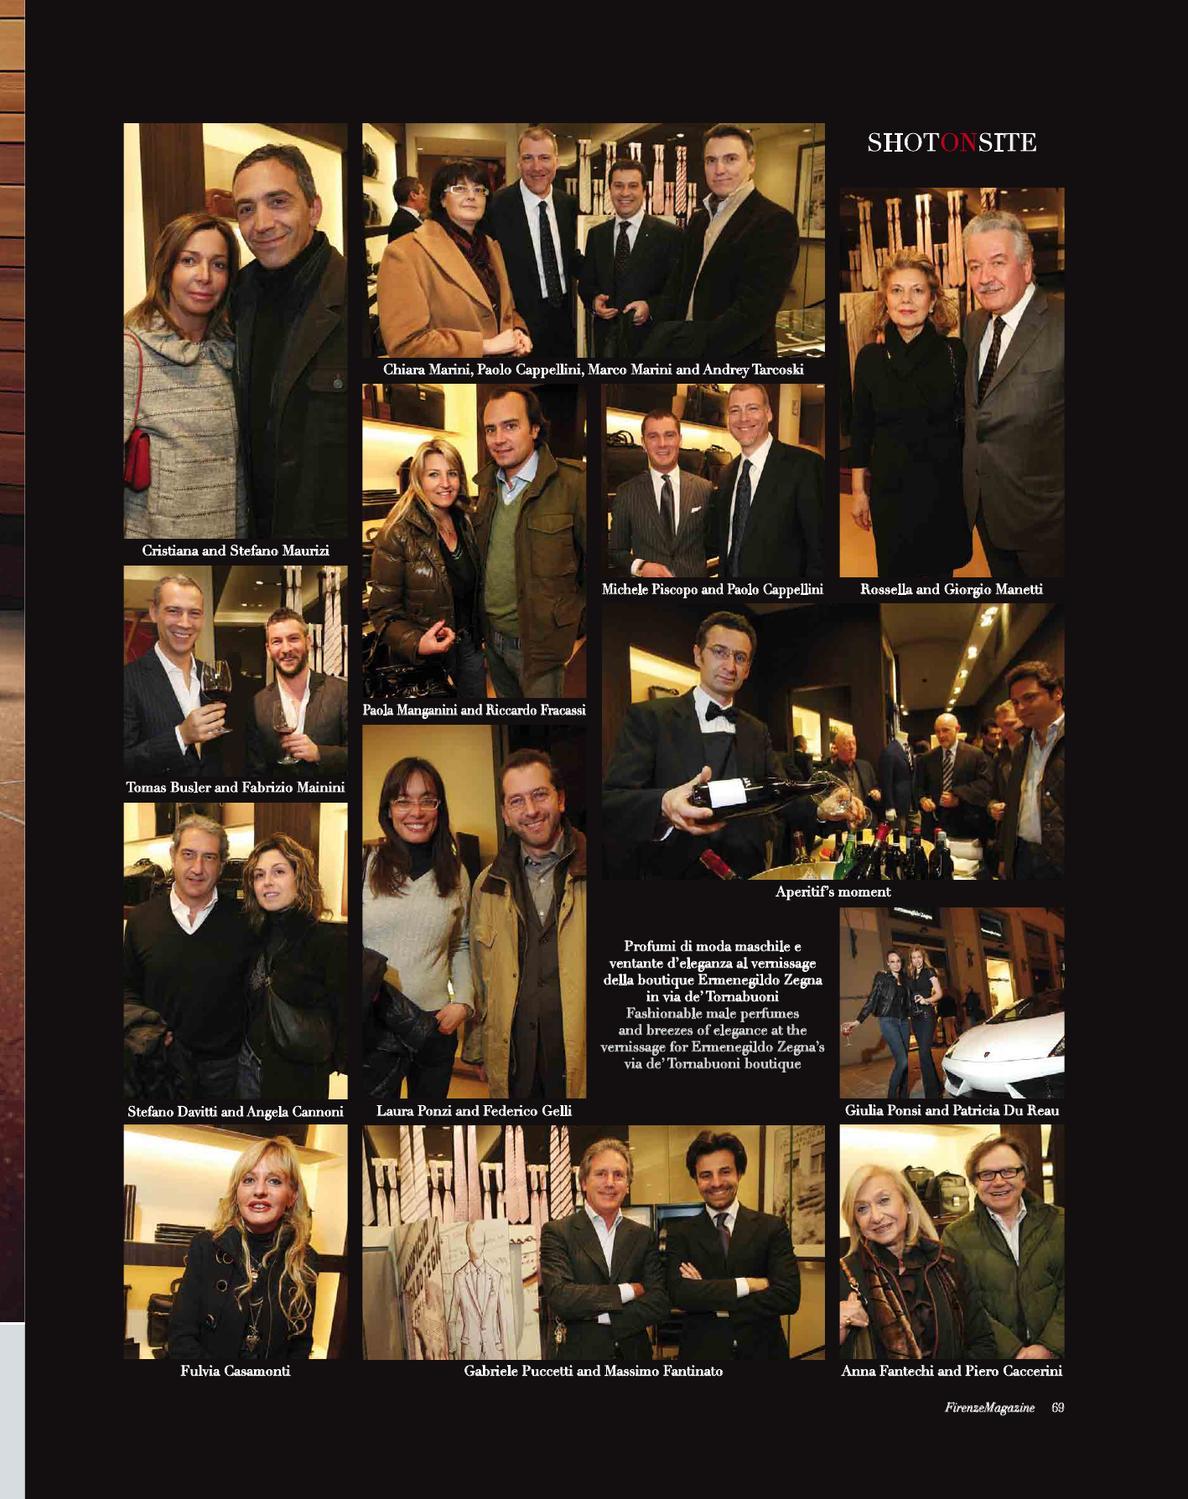 fashion style accaparramento come merce rara A basso prezzo Firenze Made in Tuscany n.10 by Gruppo Editoriale srl - issuu